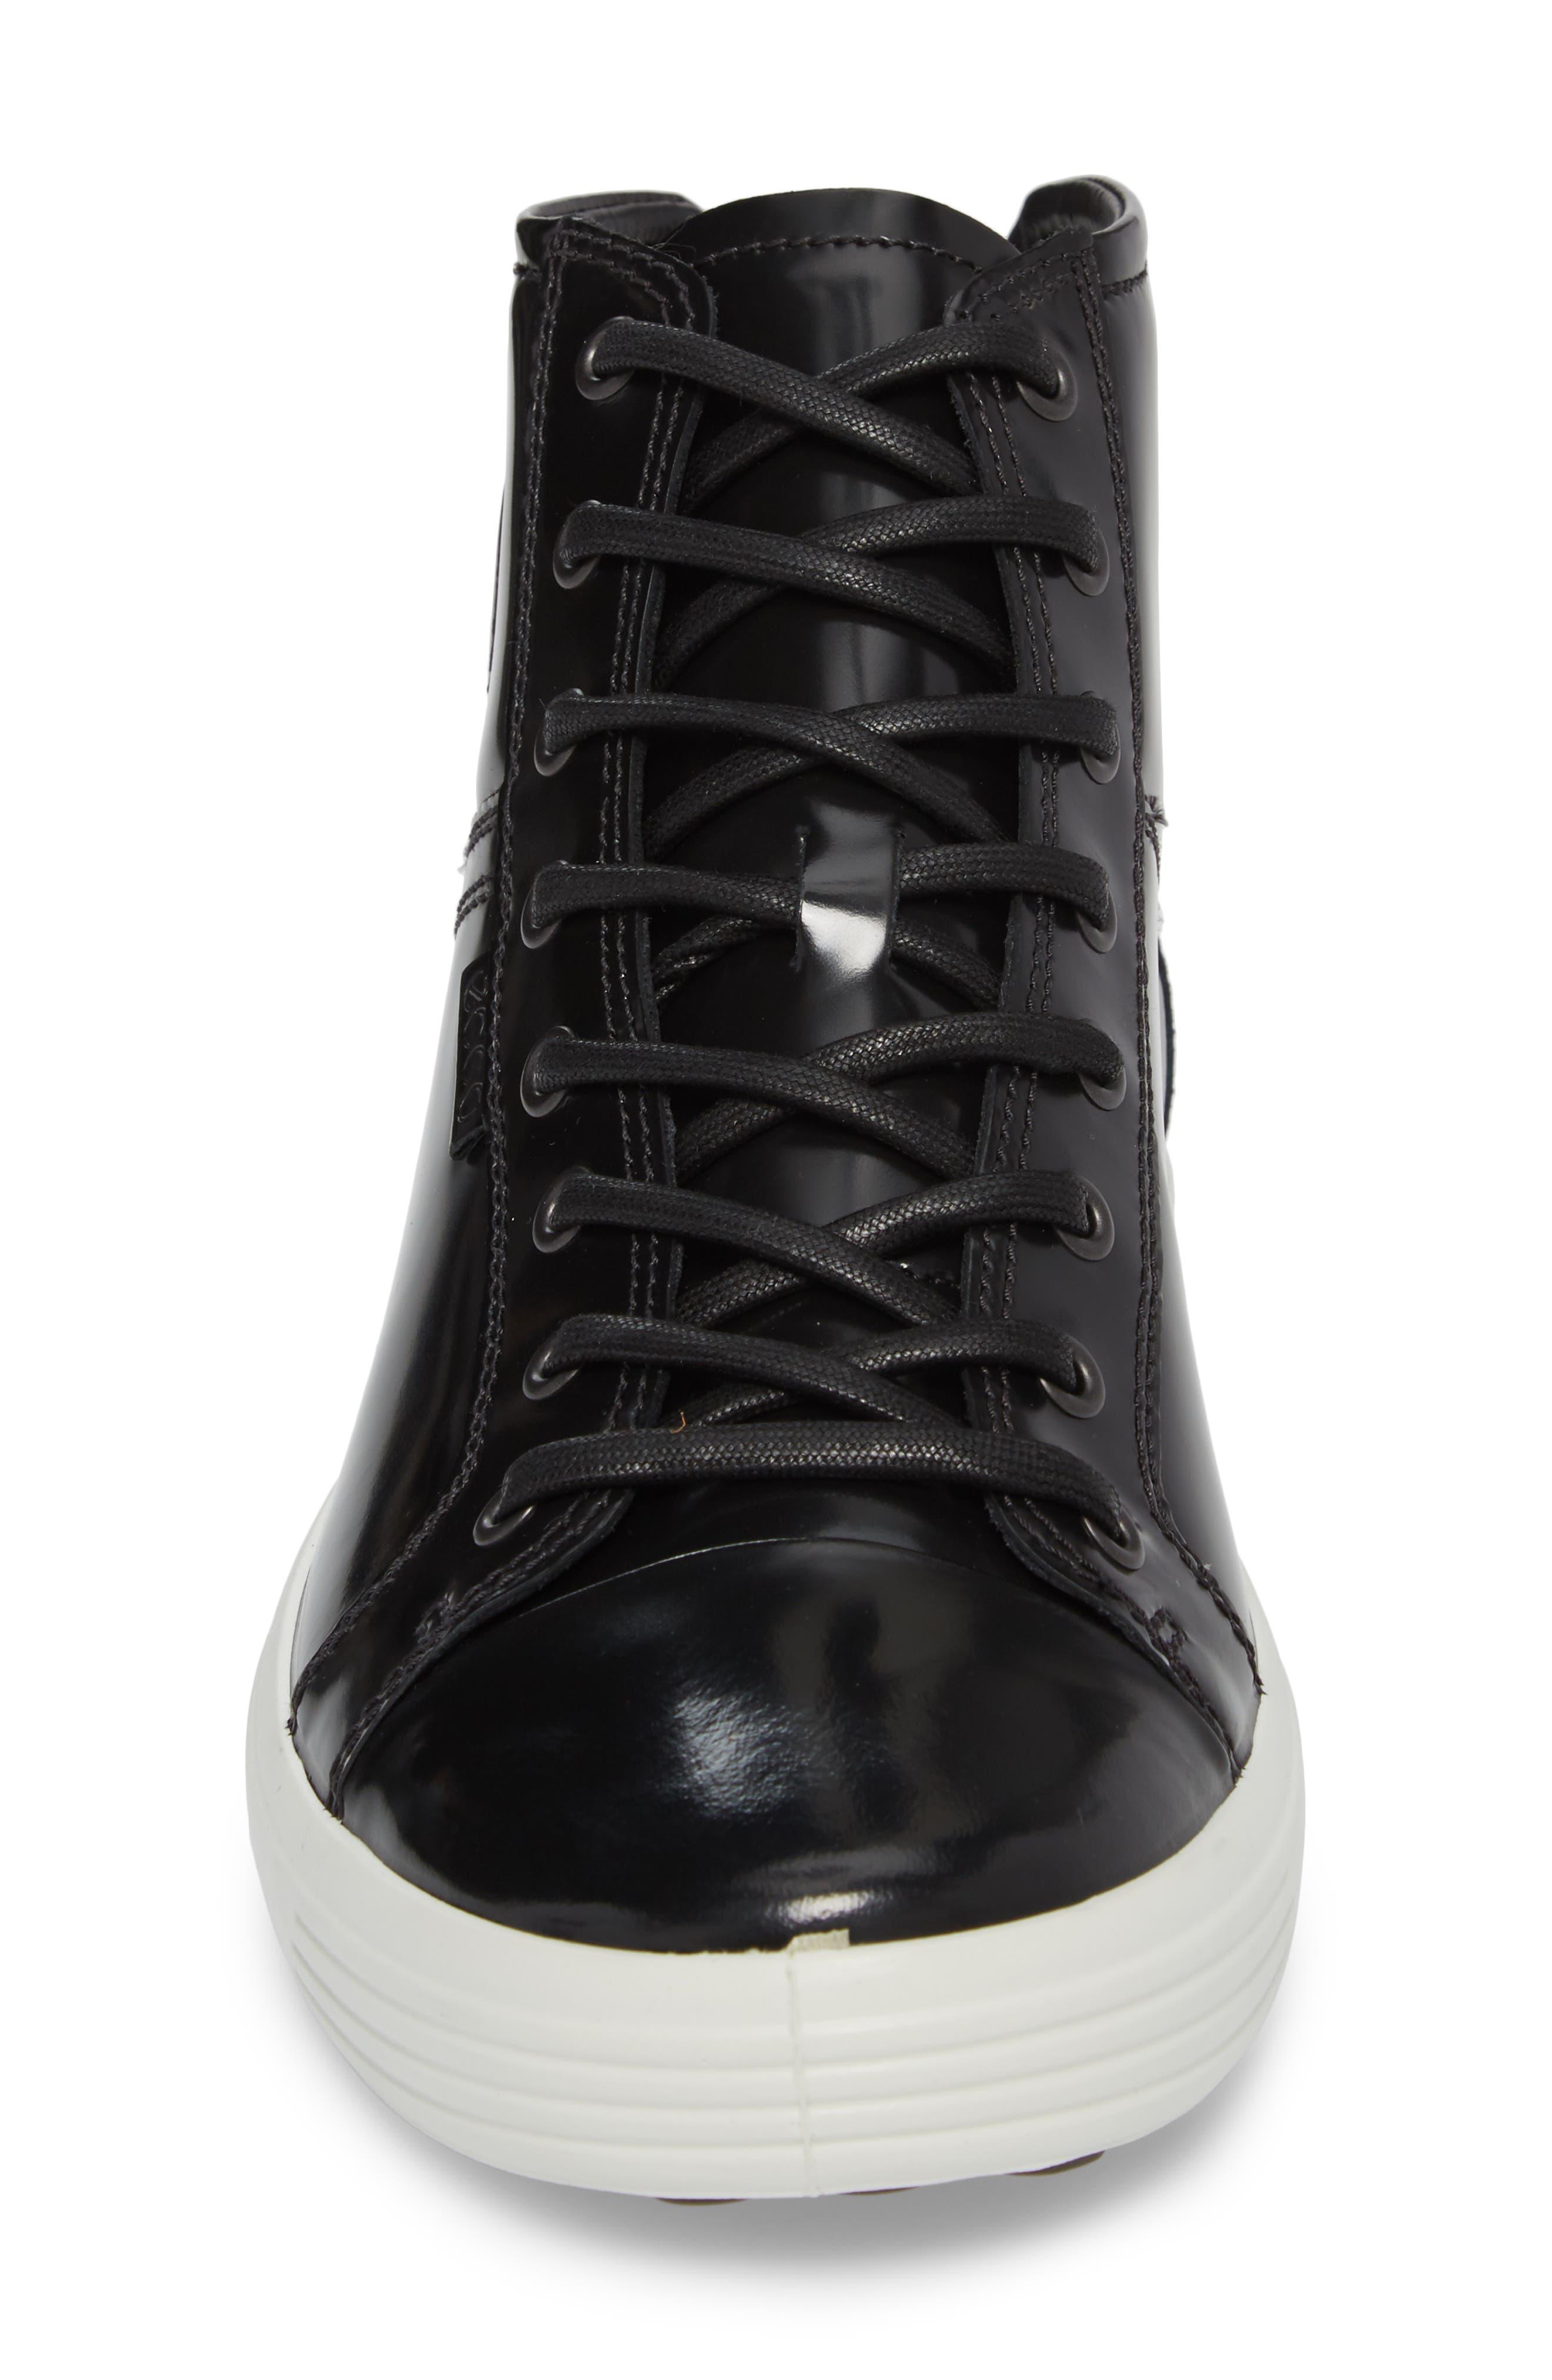 Soft 7 Premium High Top Sneaker,                             Alternate thumbnail 4, color,                             Black Leather